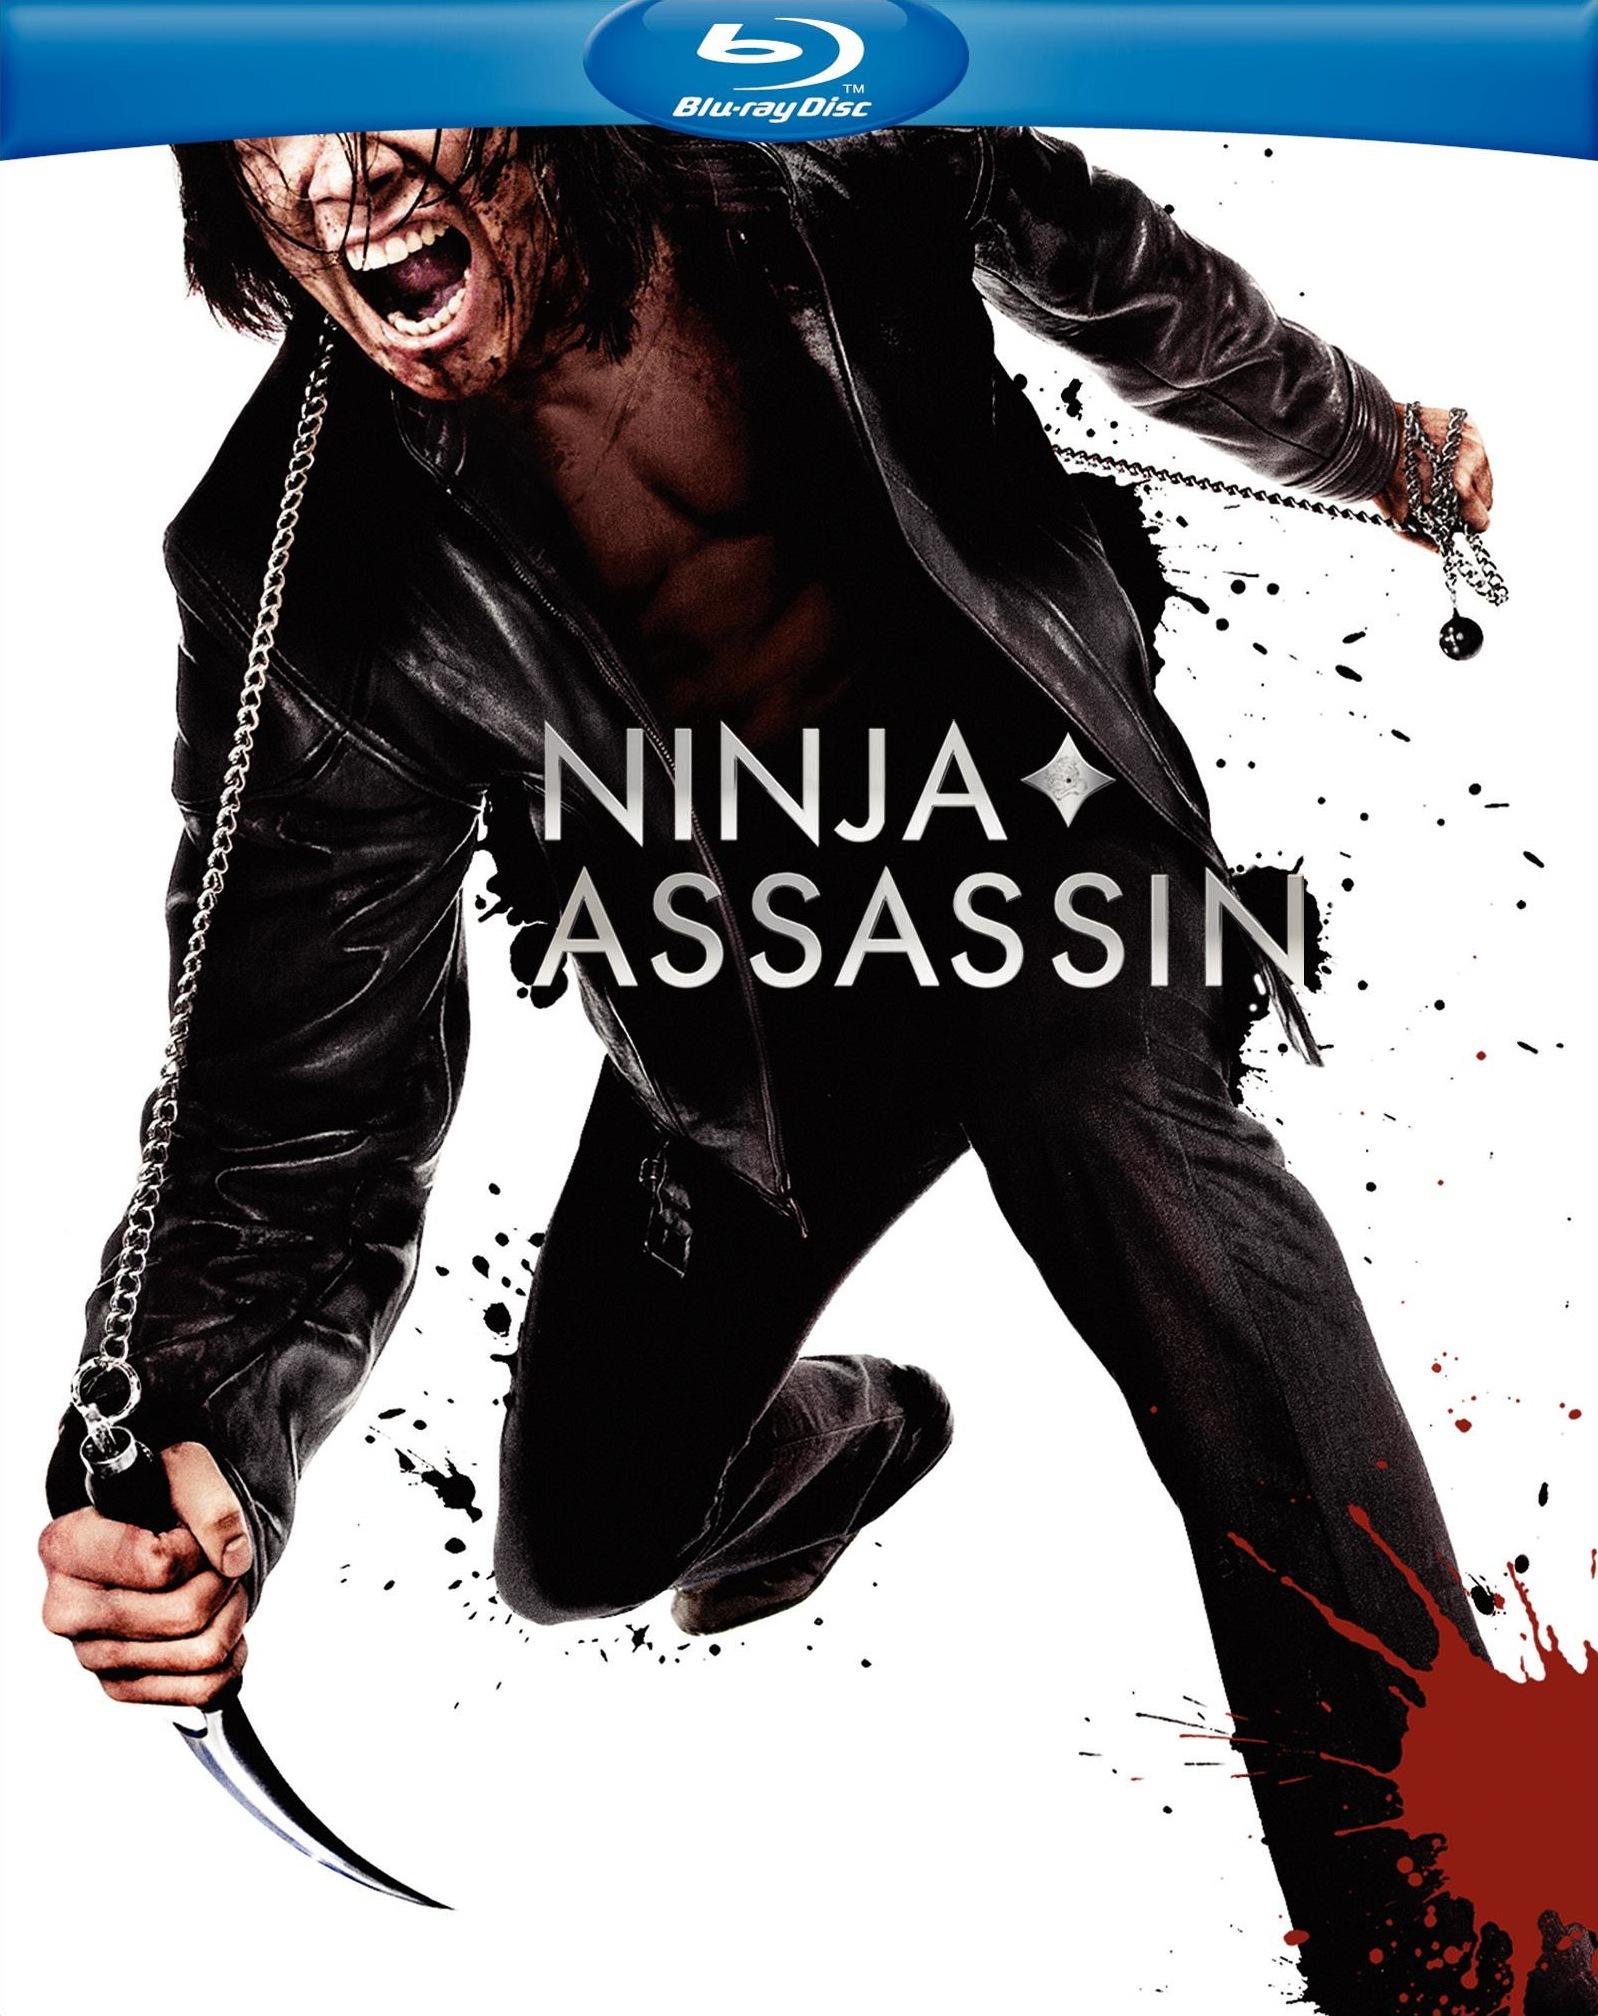 Ниндзя-убийца. Обложка с сайта blu-ray.com